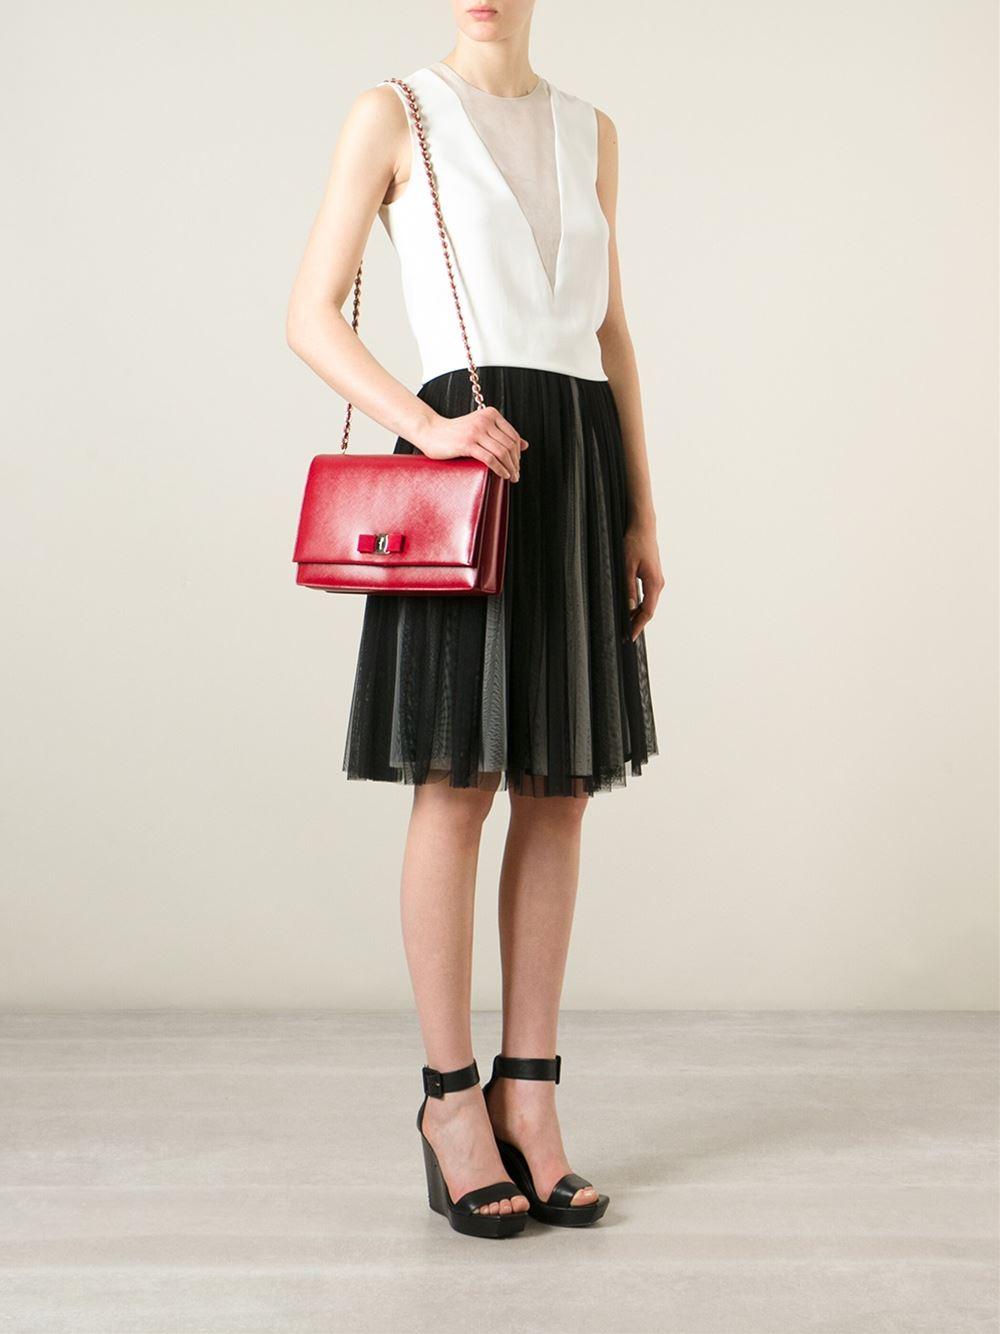 ... info for ed973 7be4a Ferragamo Ginny Leather Cross-Body Bag in Red -  Lyst ... 2ed3e3ffe5